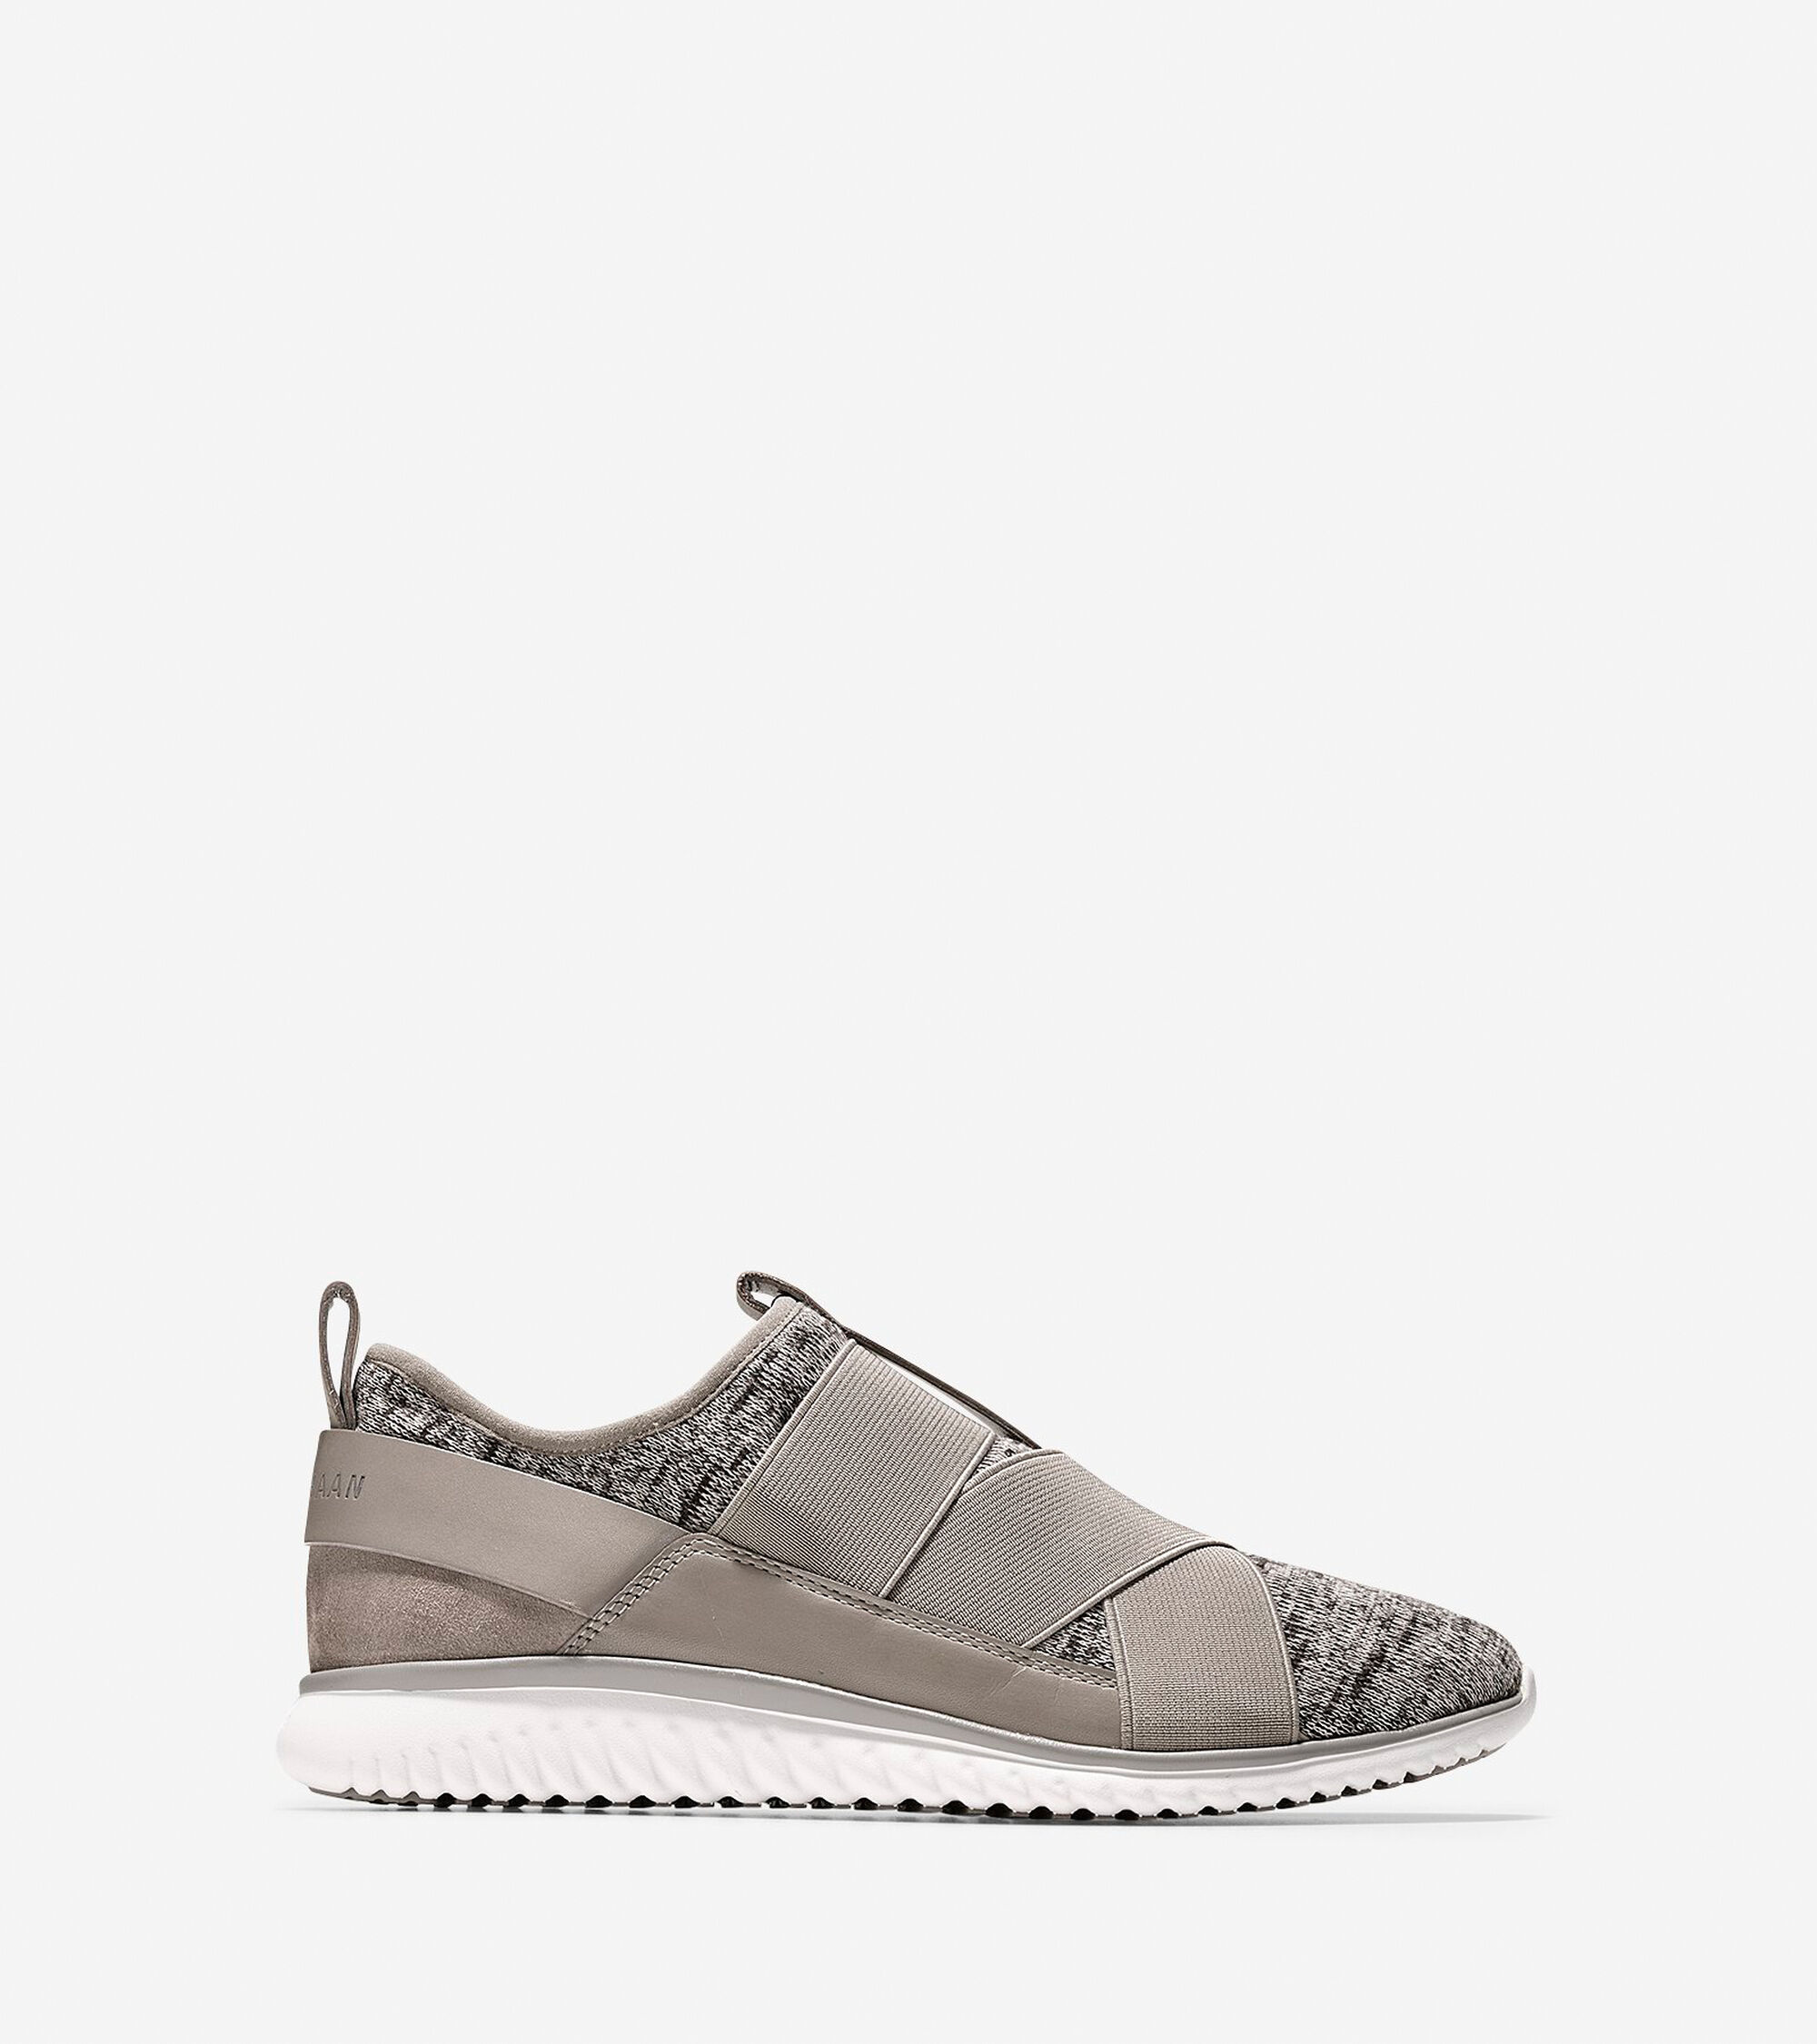 Cole Haan Womens StudioGrand Knit Cross-Strap Sneaker